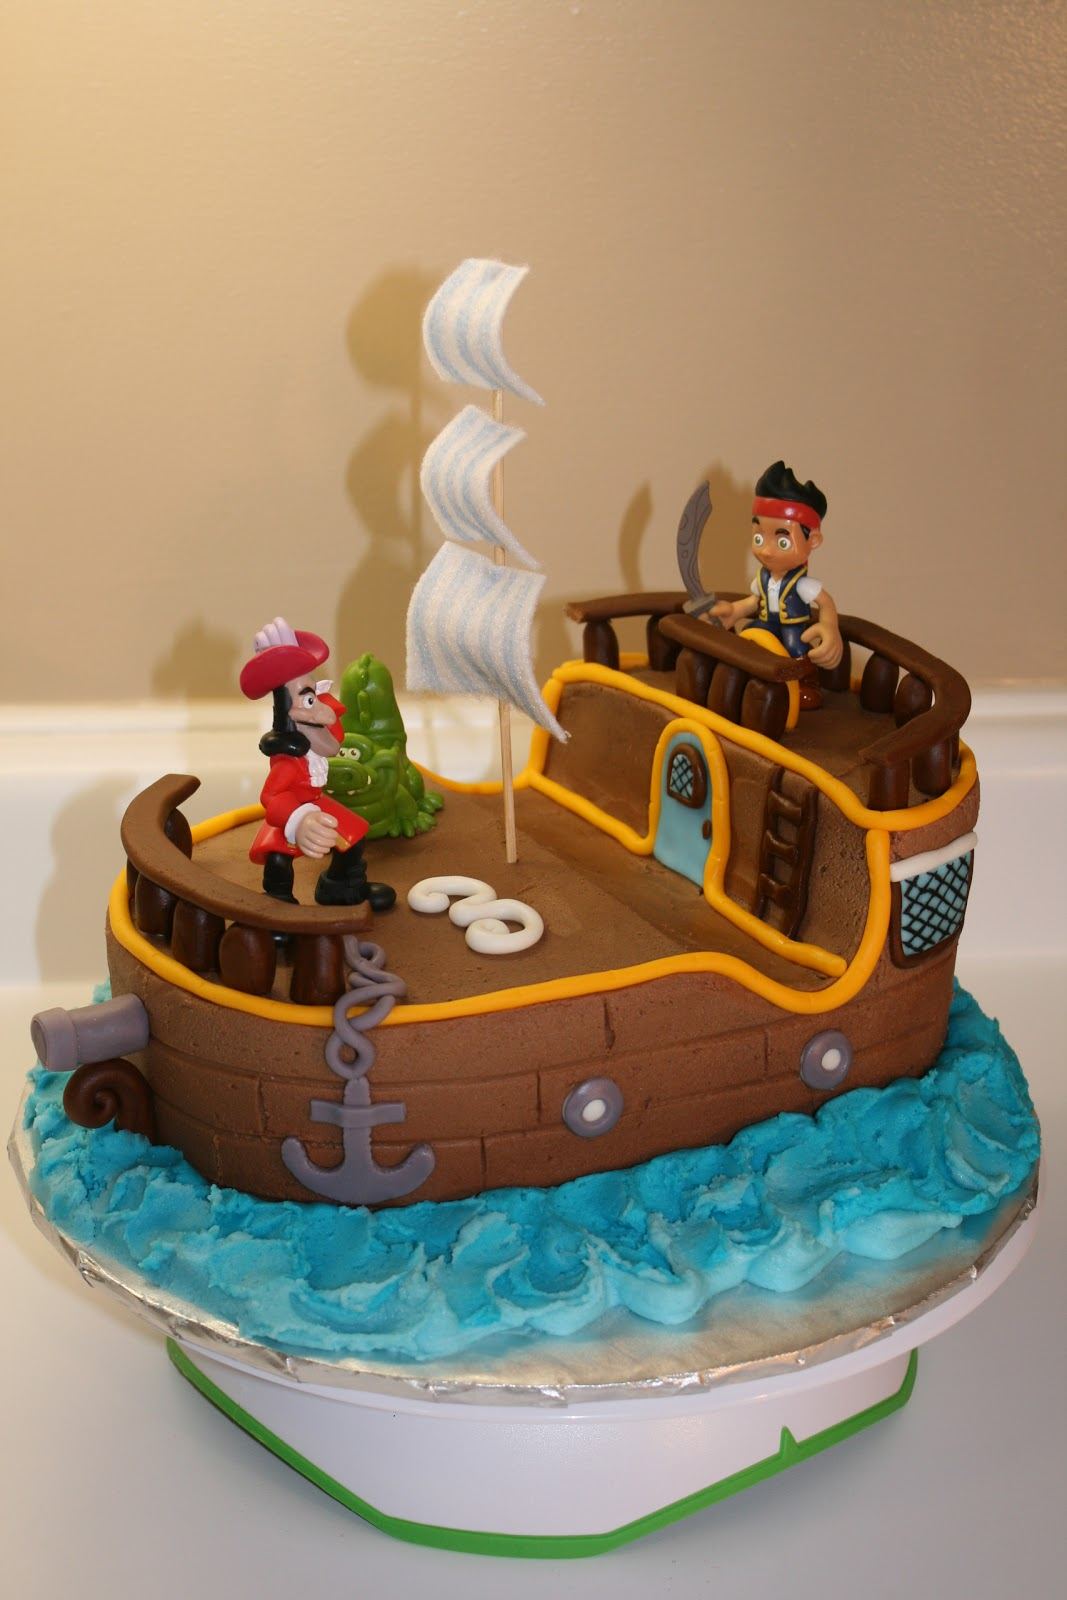 Blessed Hands Cake Design: Jake & The Neverland Pirates Cake